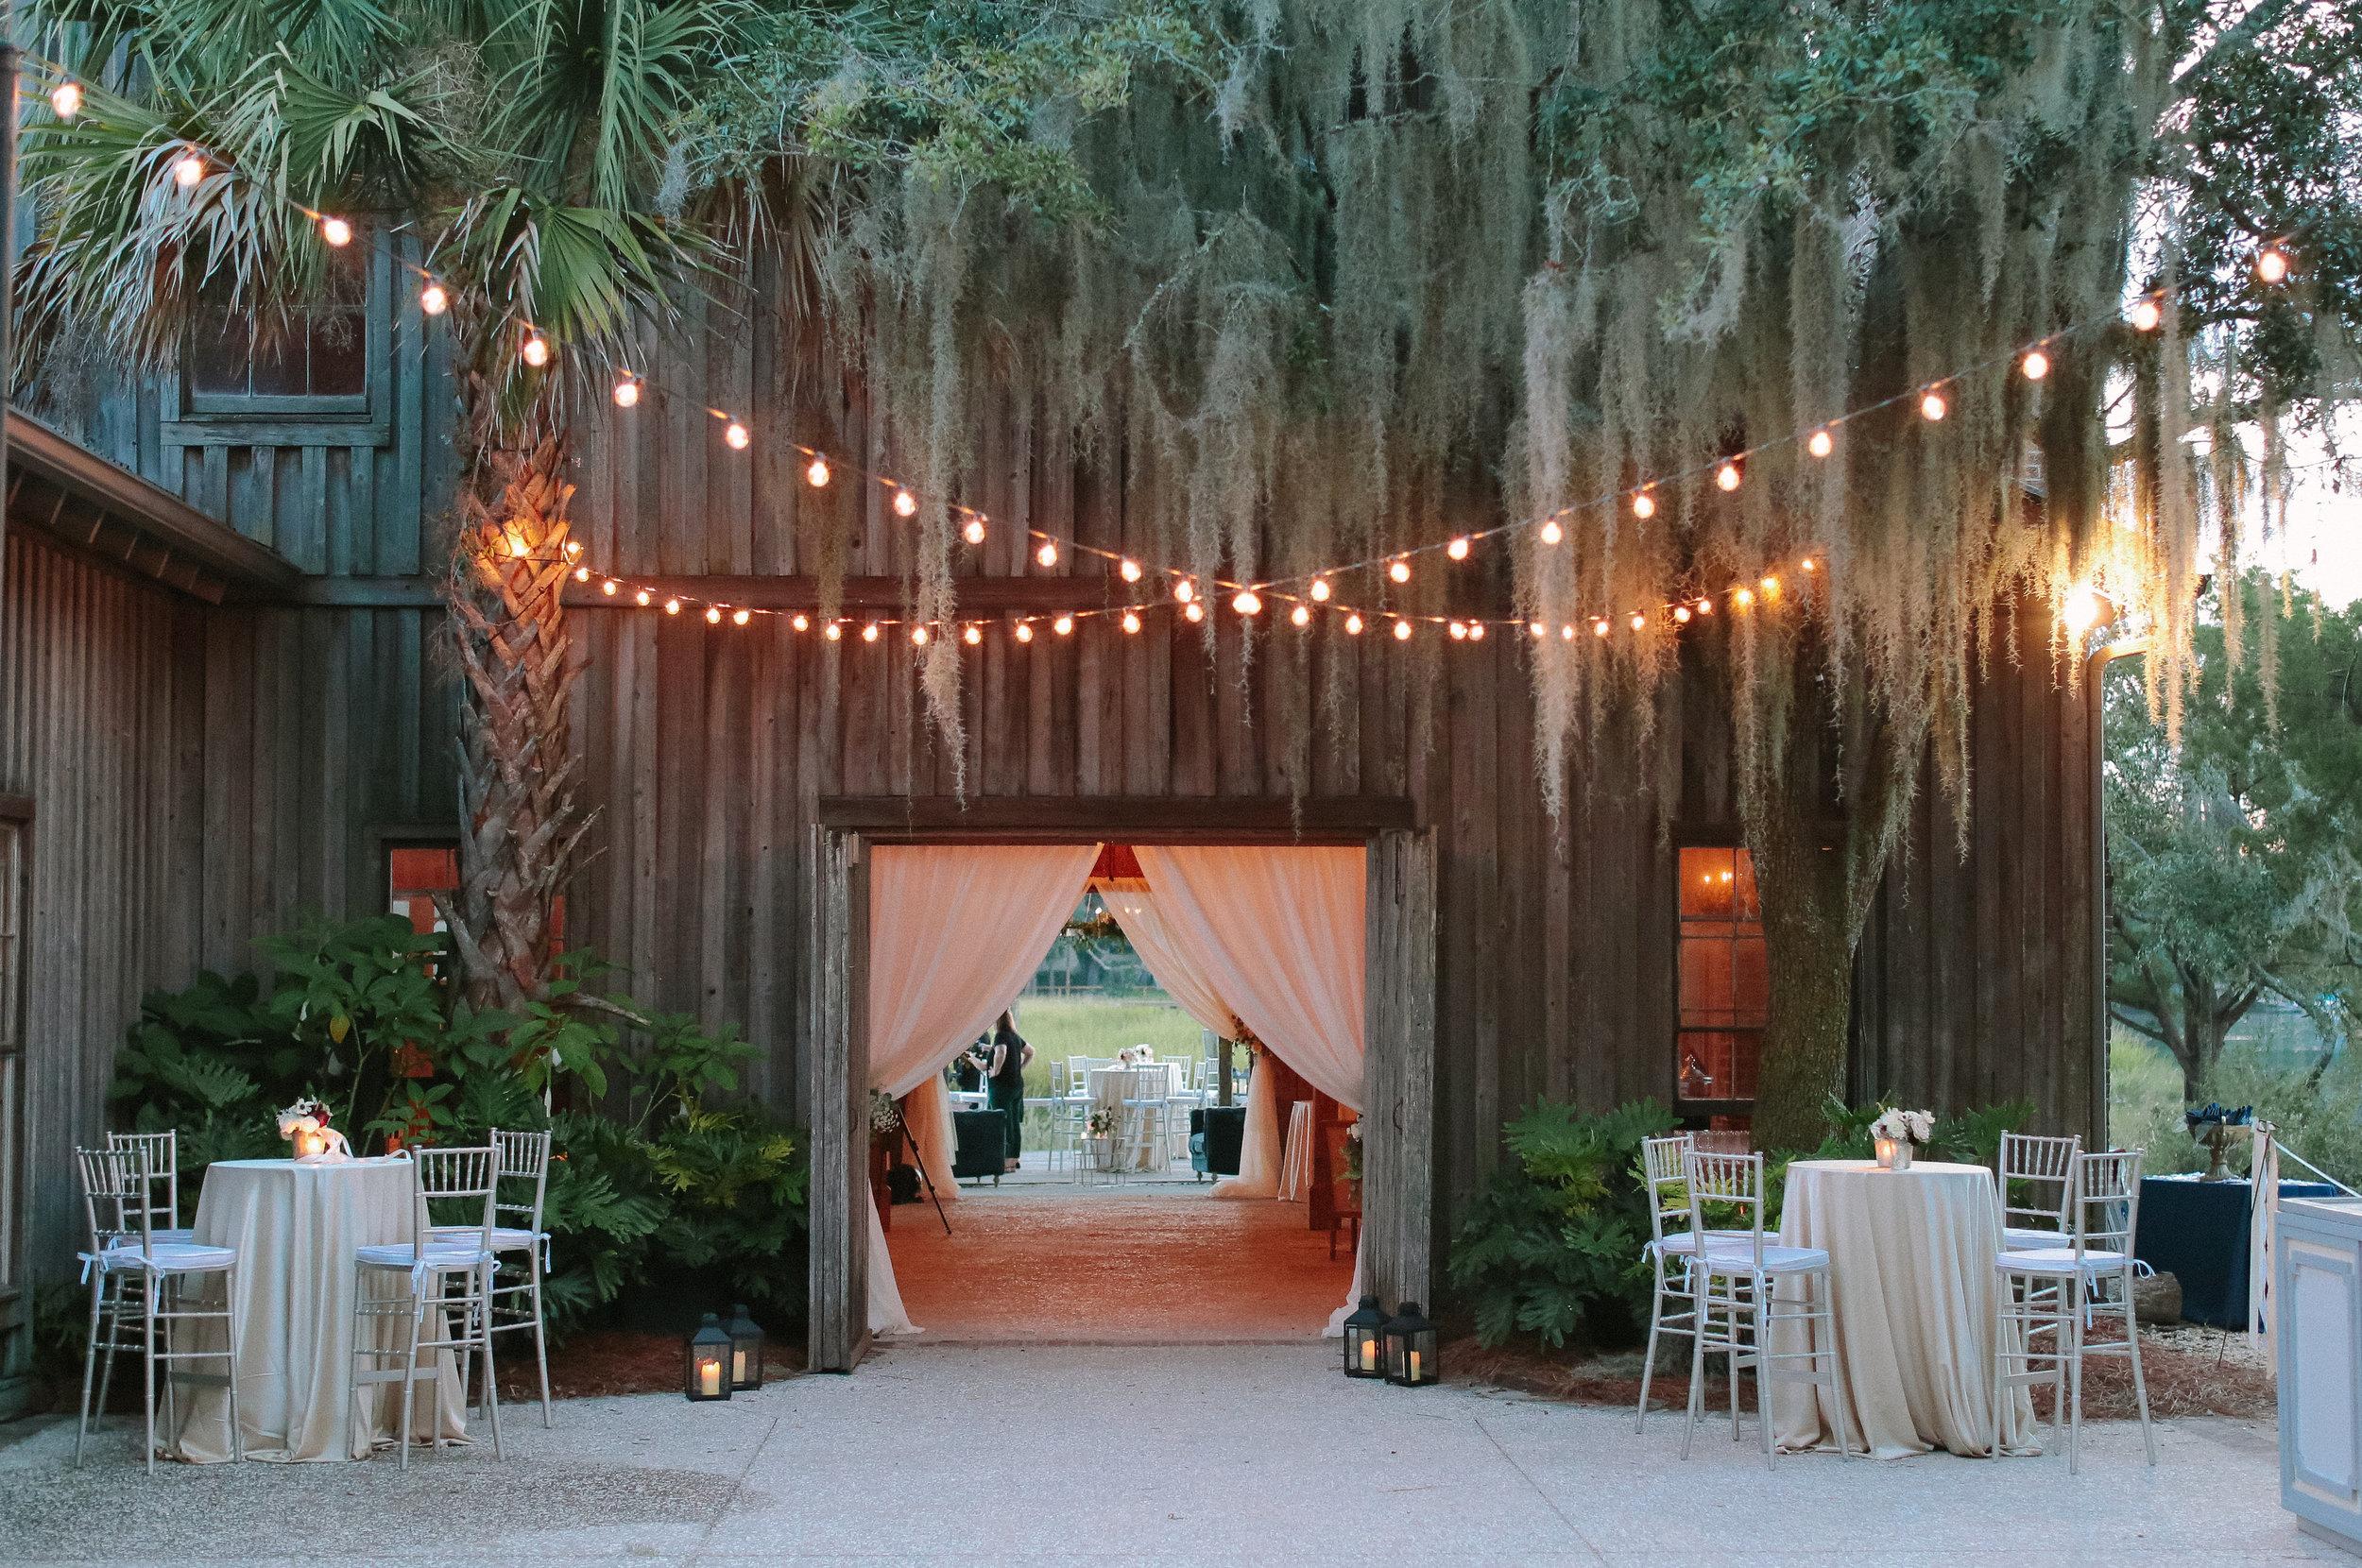 Boone Hall Plantation wedding reception at The Cotton Dock by Landon Jacob